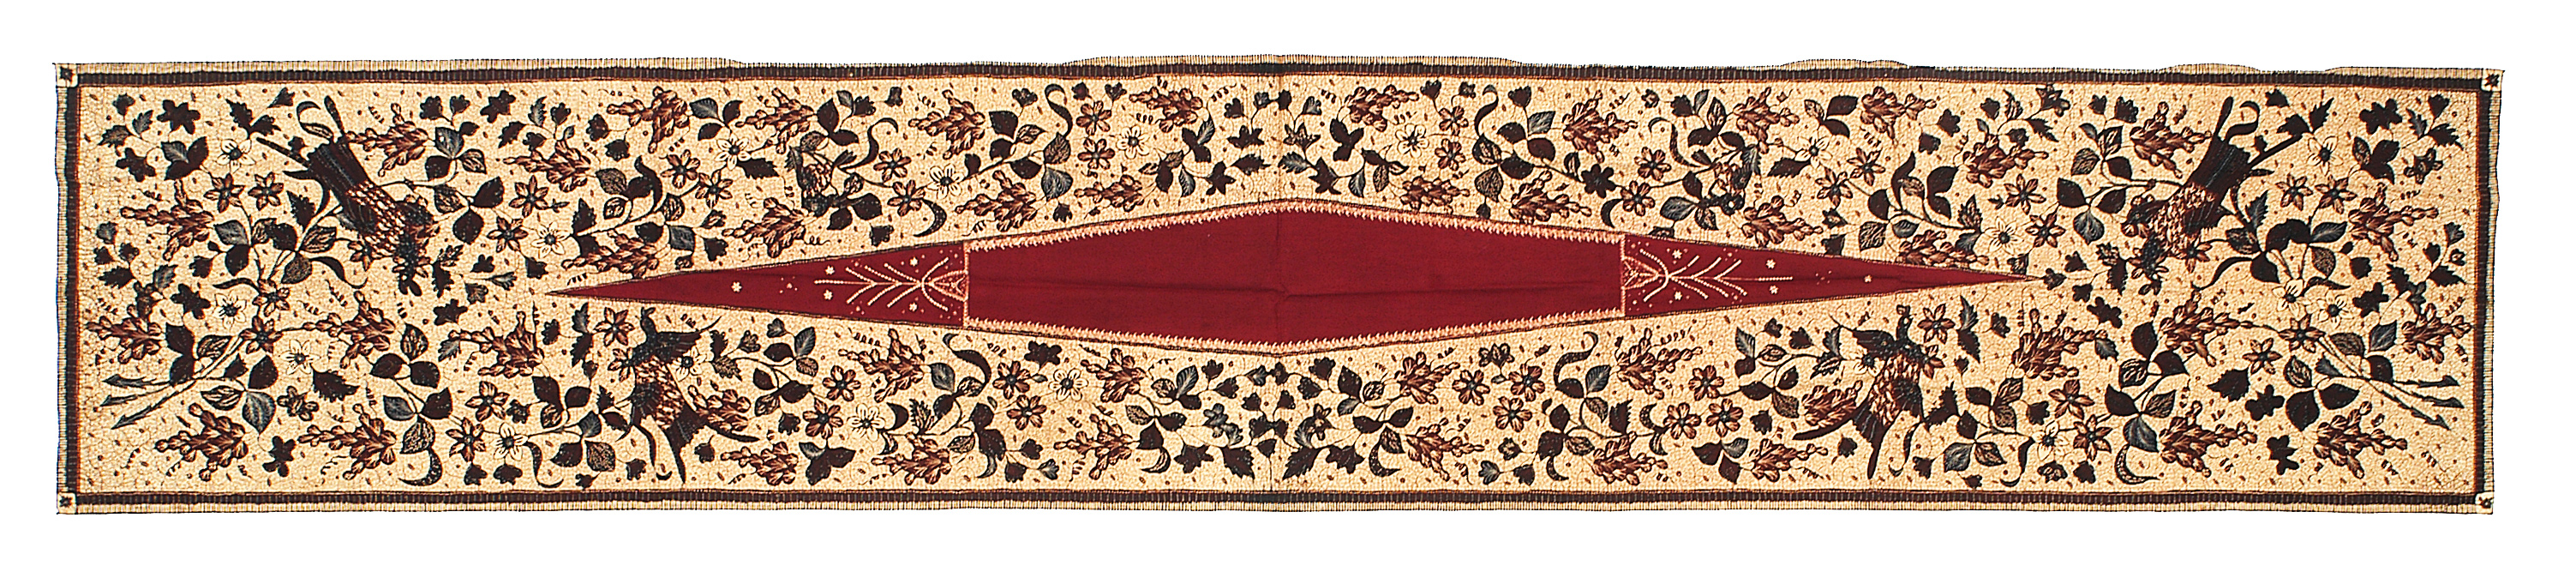 "Batik kemben, central Java, Indonesia, 20th century. 0.51 x 2.81 m (1' 8"" x 9' 3""). Textile Museum, Jakarta, Gift of Rudolf Smend"